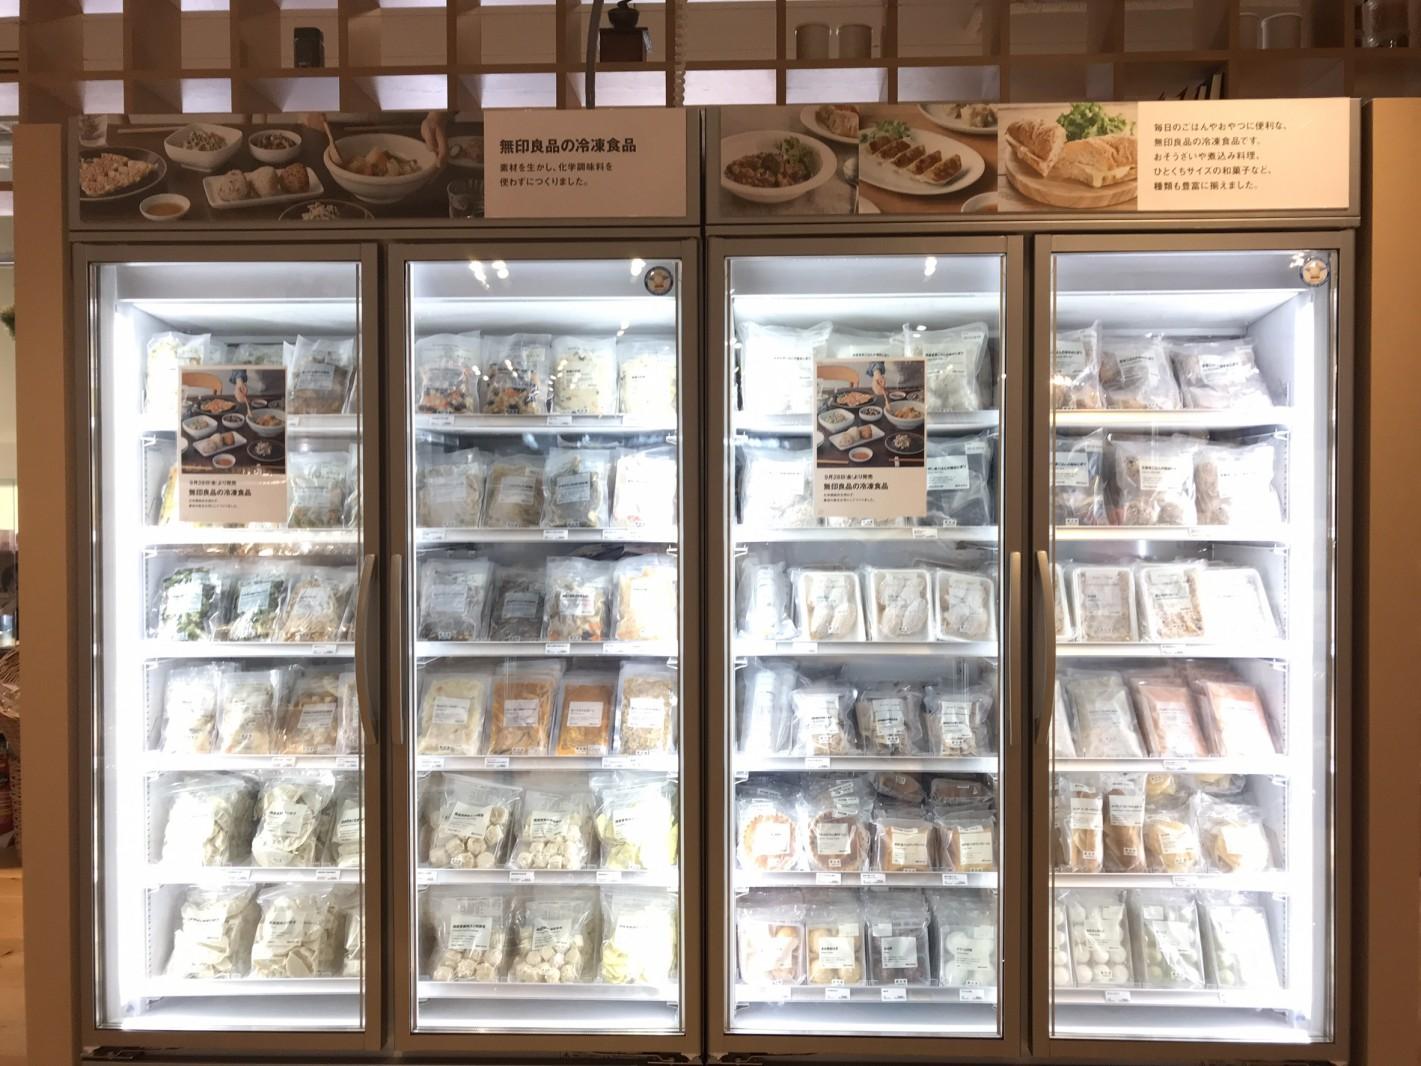 TBS・ジョブチューン9/19放送 「無印良品」の食品 冒頭はムジラー注目の冷凍食品 「エフエフプレス」記事も紹介されました!